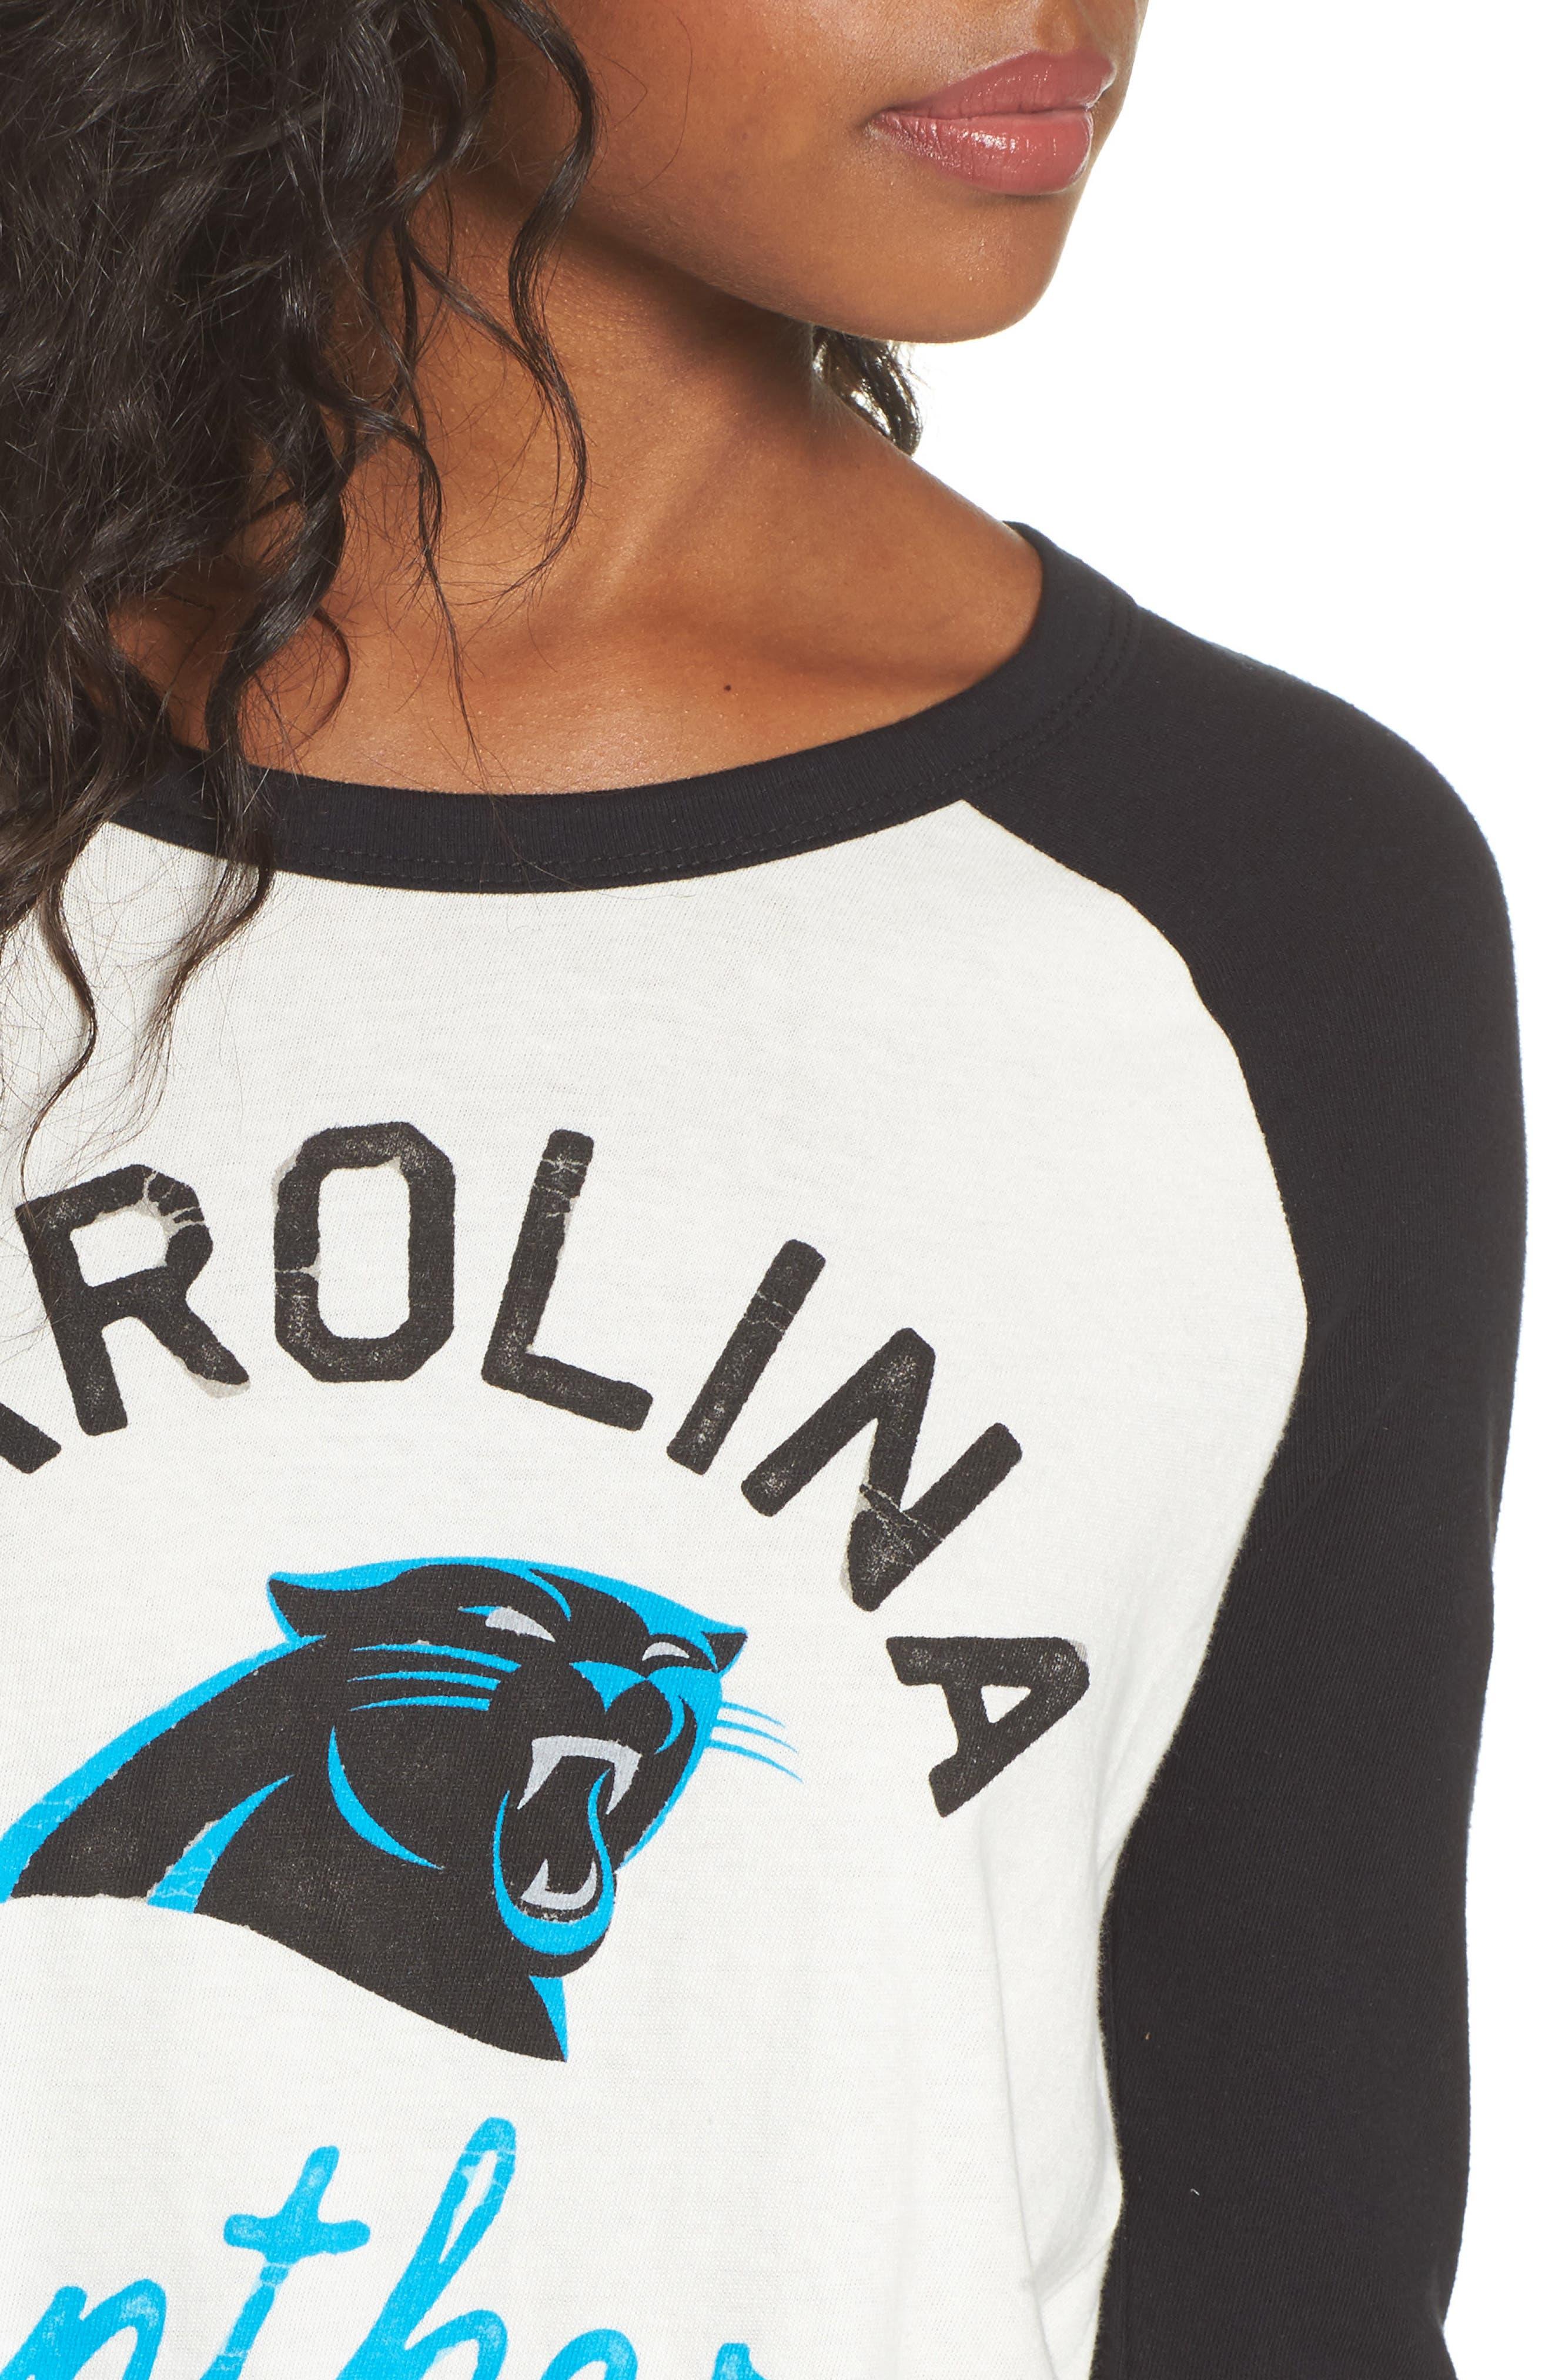 NFL Carolina Panthers Raglan Tee,                             Alternate thumbnail 4, color,                             Sugar/ True Black